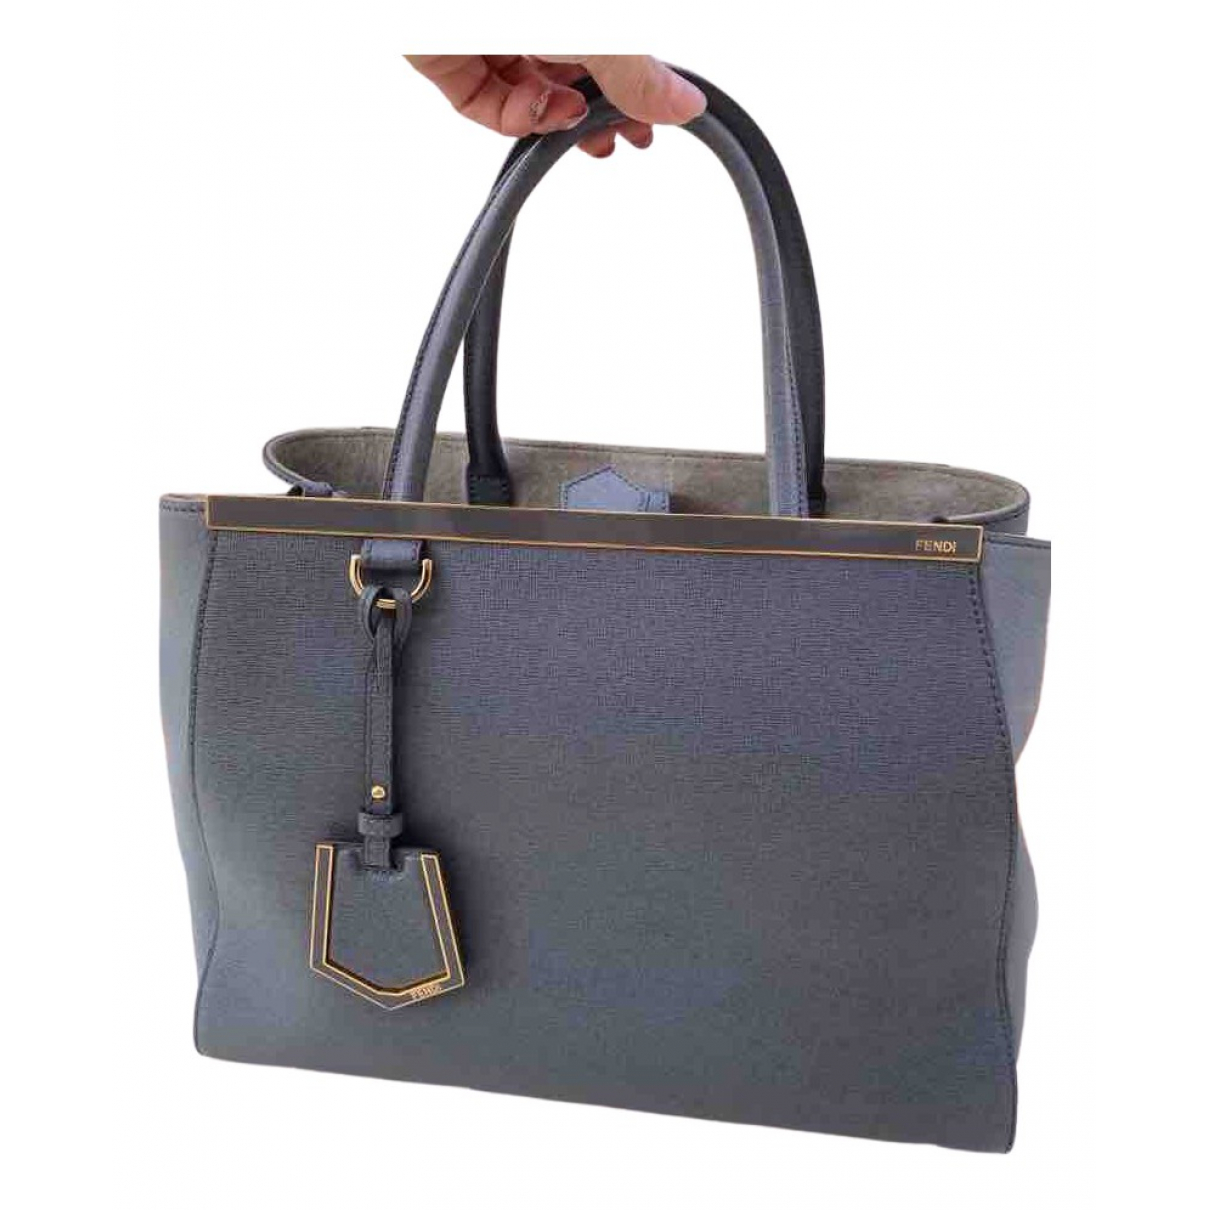 Fendi 2Jours Handtasche in  Grau Leder